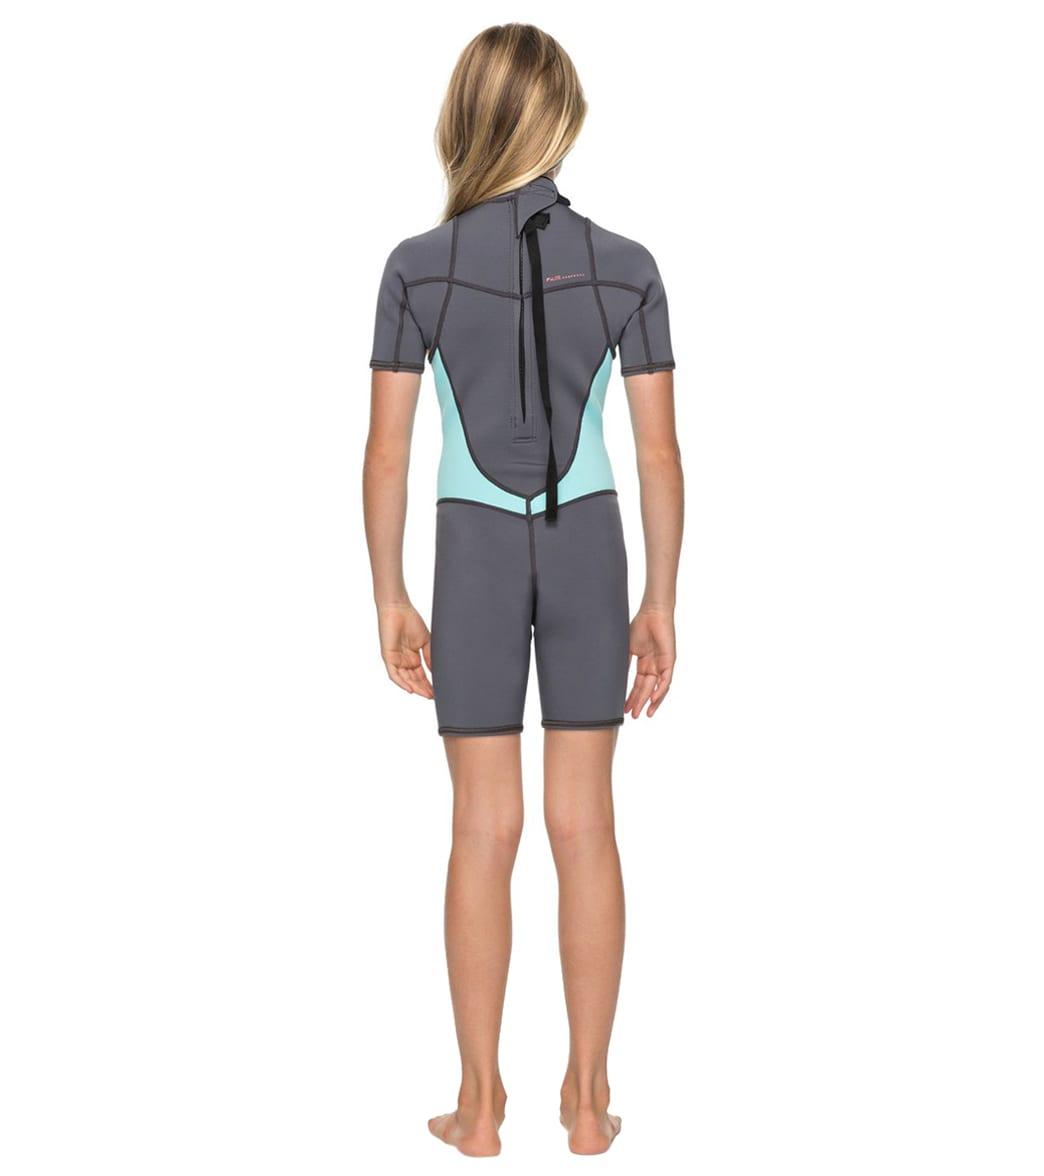 166d3336f Roxy Girls  2MM Syncro Series Short Sleeve Back Zip FLT Springsuit (Big Kid)